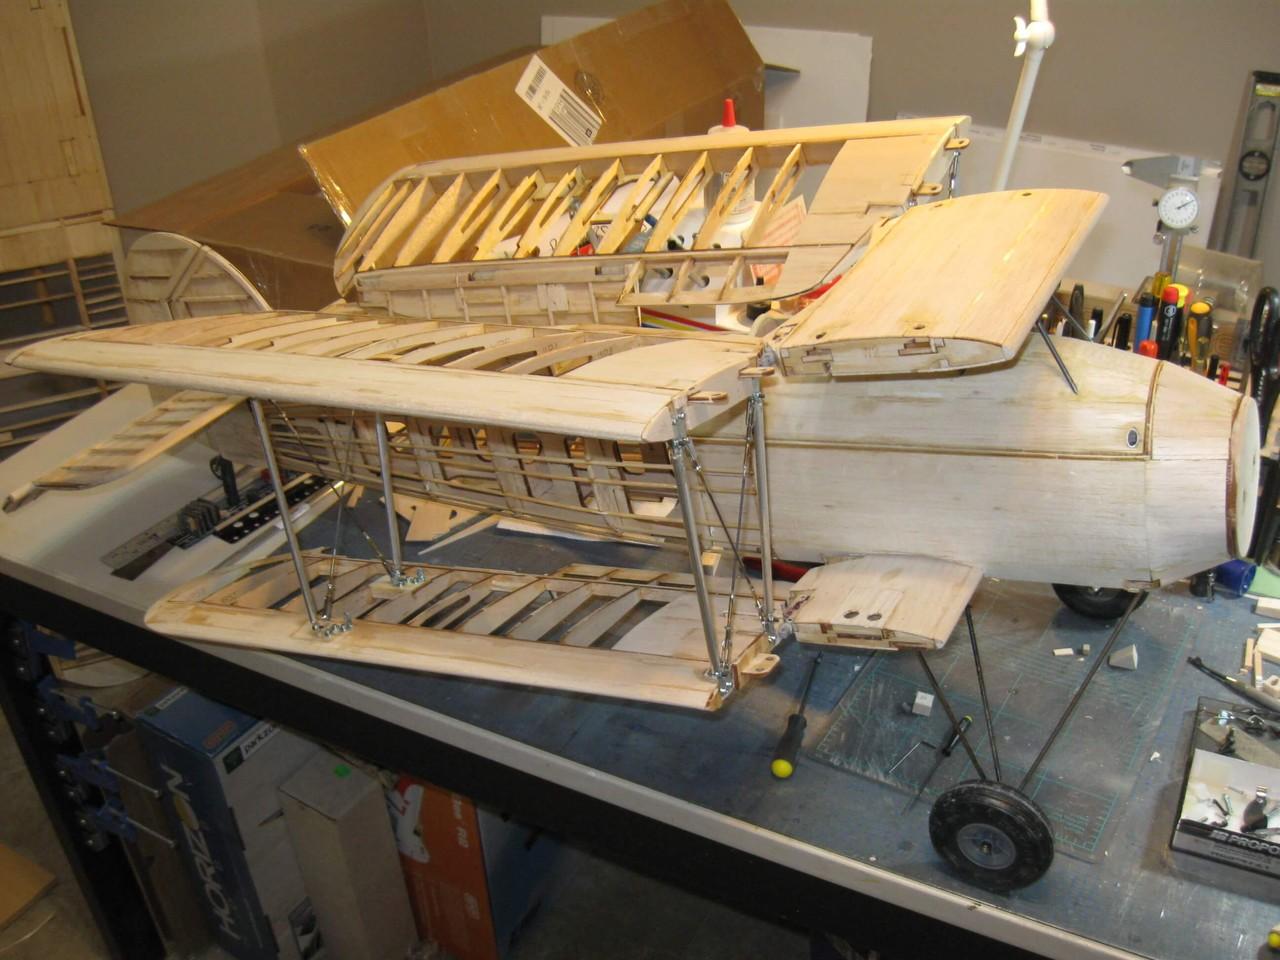 RC Fairey Swordfish -1/10 scale: Construction shot of wings folded.